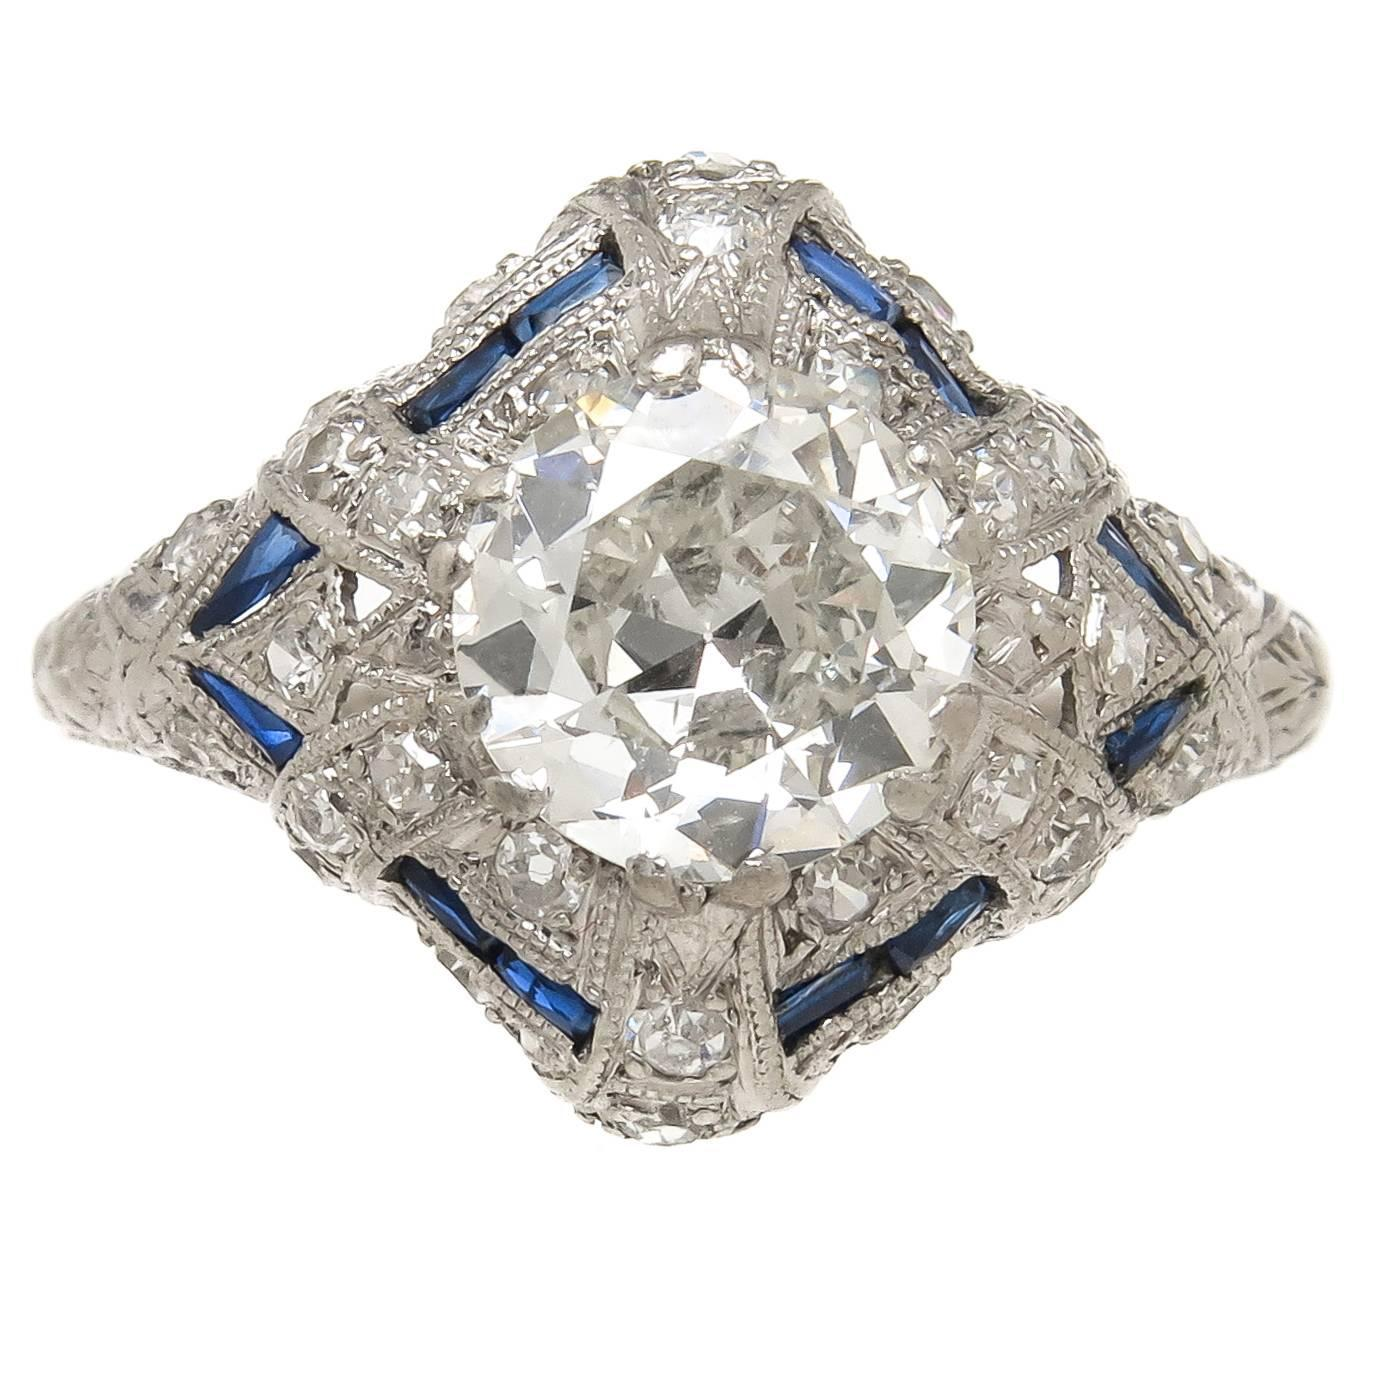 Gemstone Engagement Rings Chicago: 1930 Diamond Platinum Engagement Ring For Sale At 1stdibs